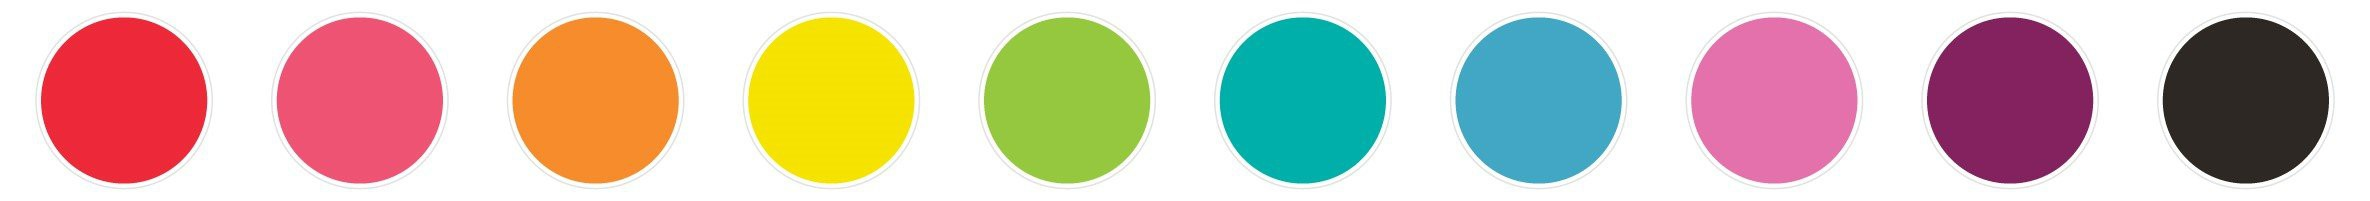 Sc preview colorpalette september desktop palette